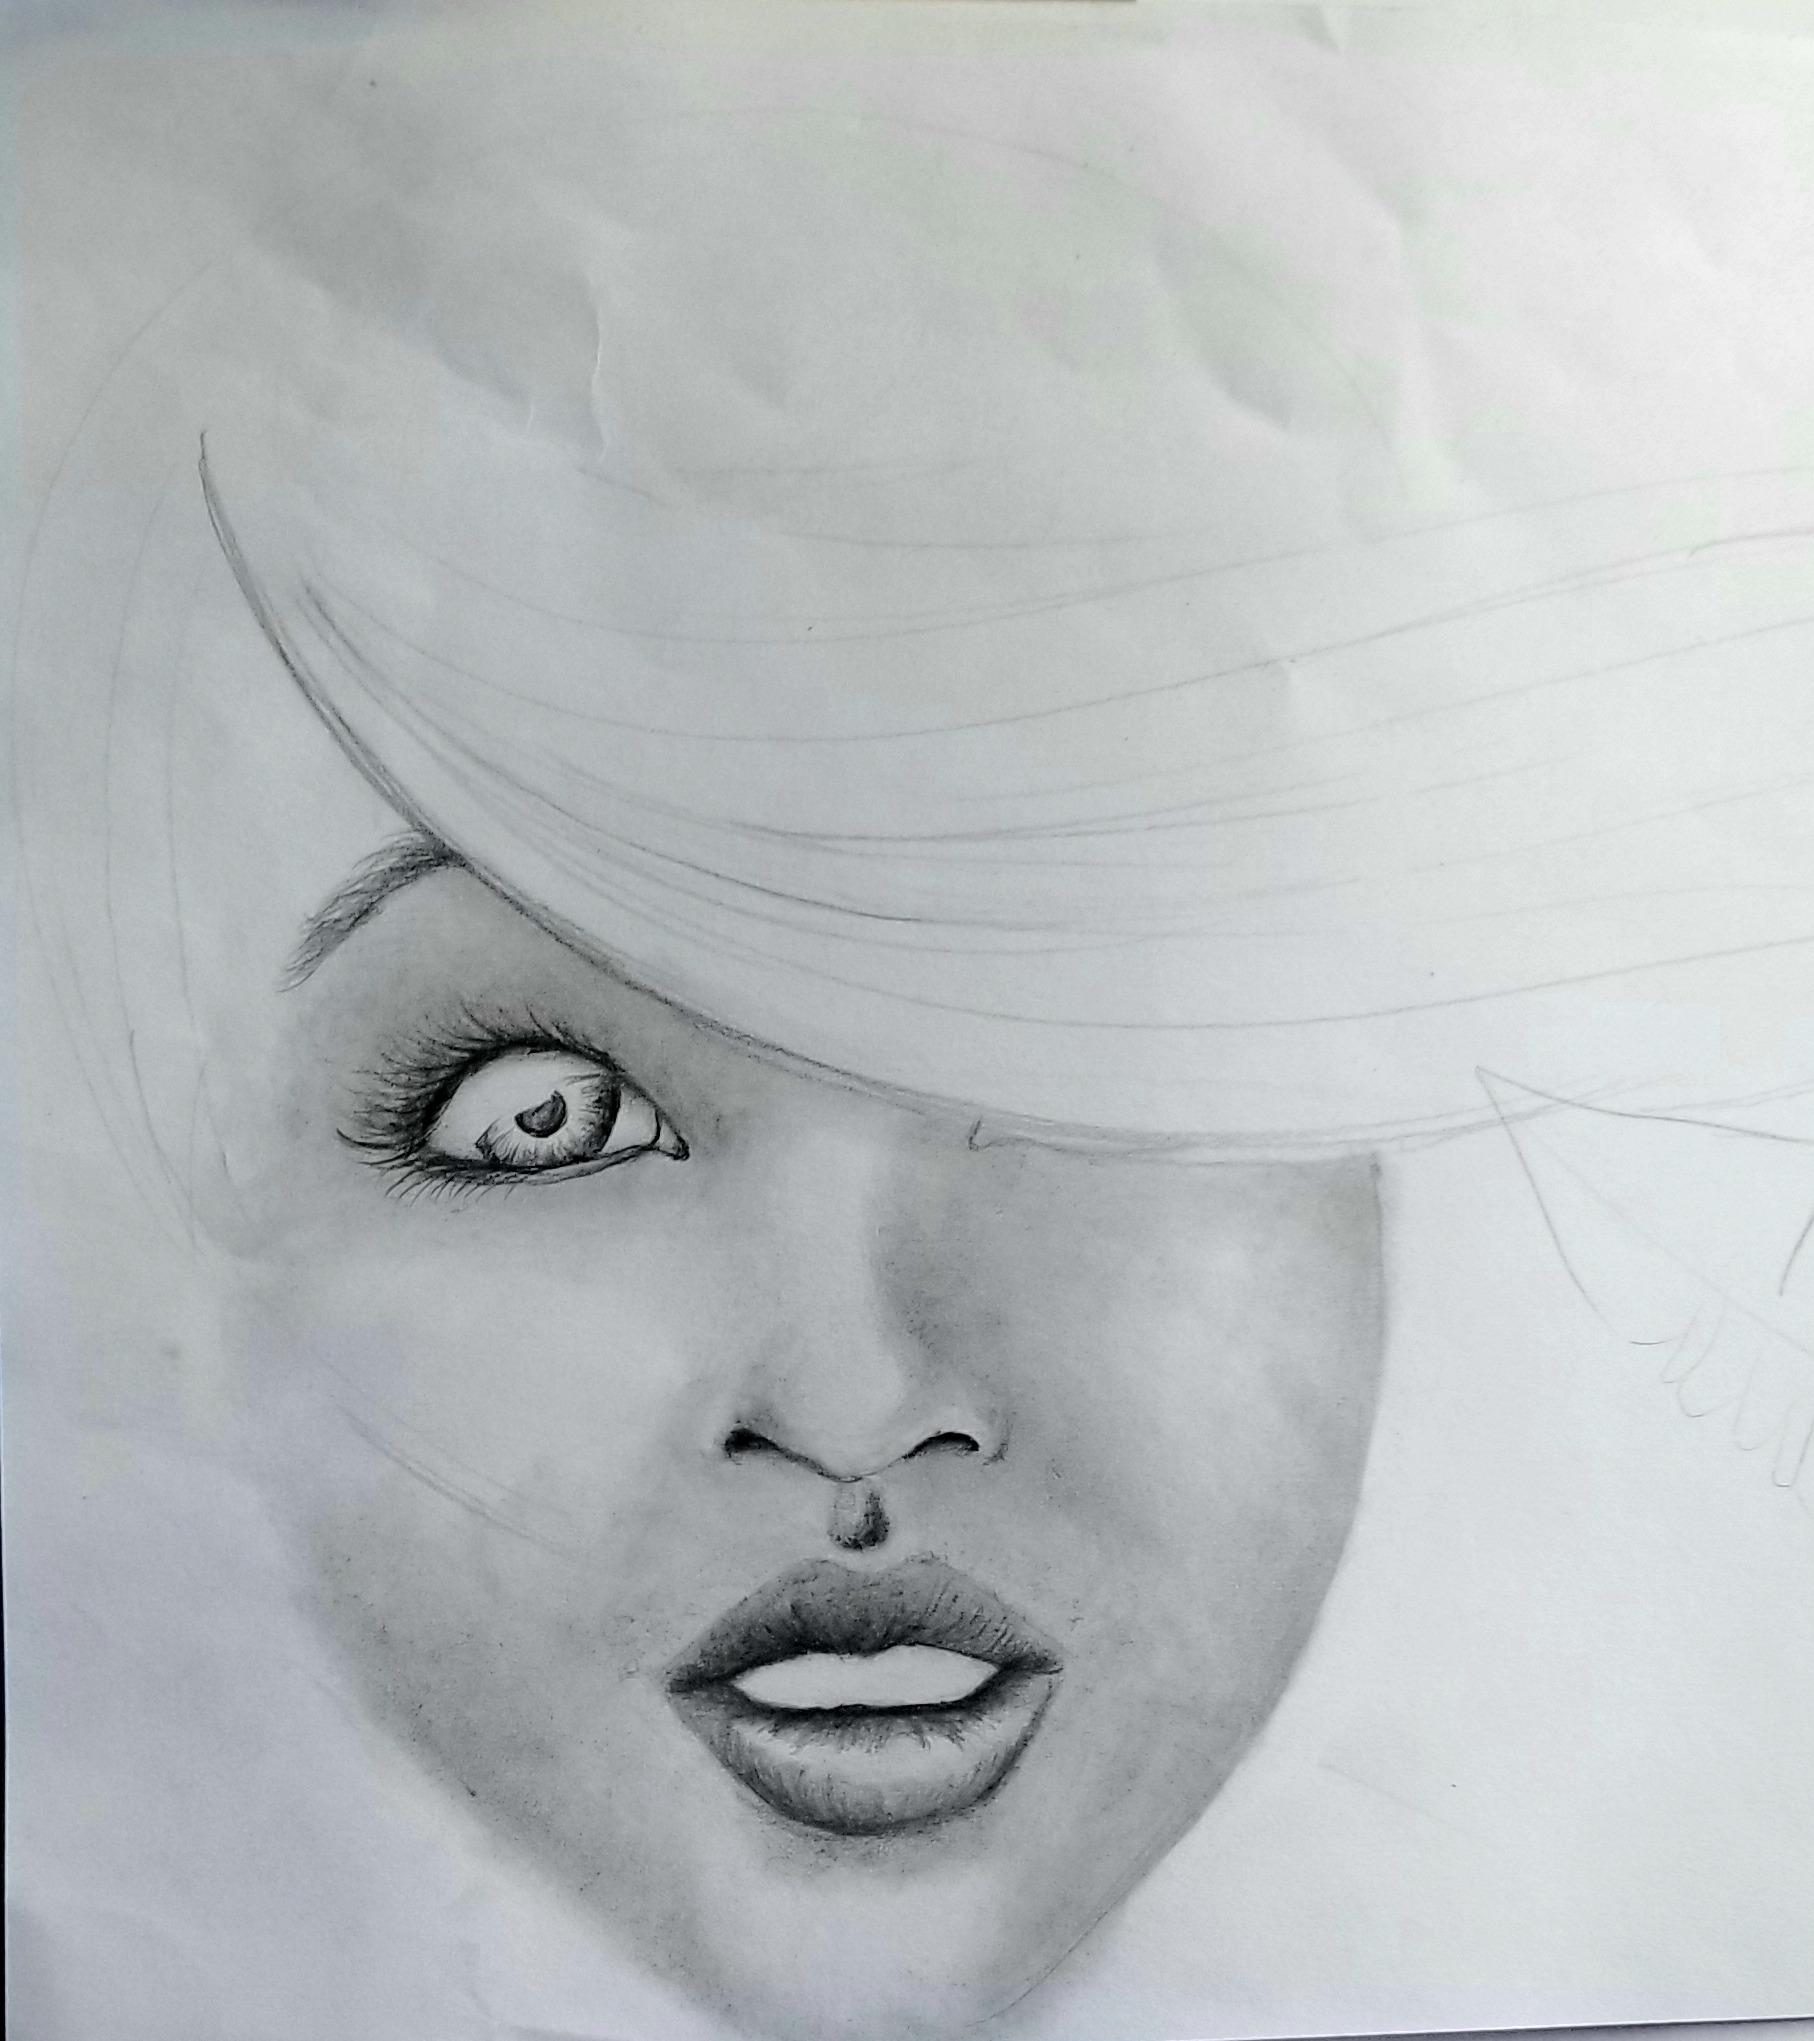 Unfinished but I like it so it's un-u...